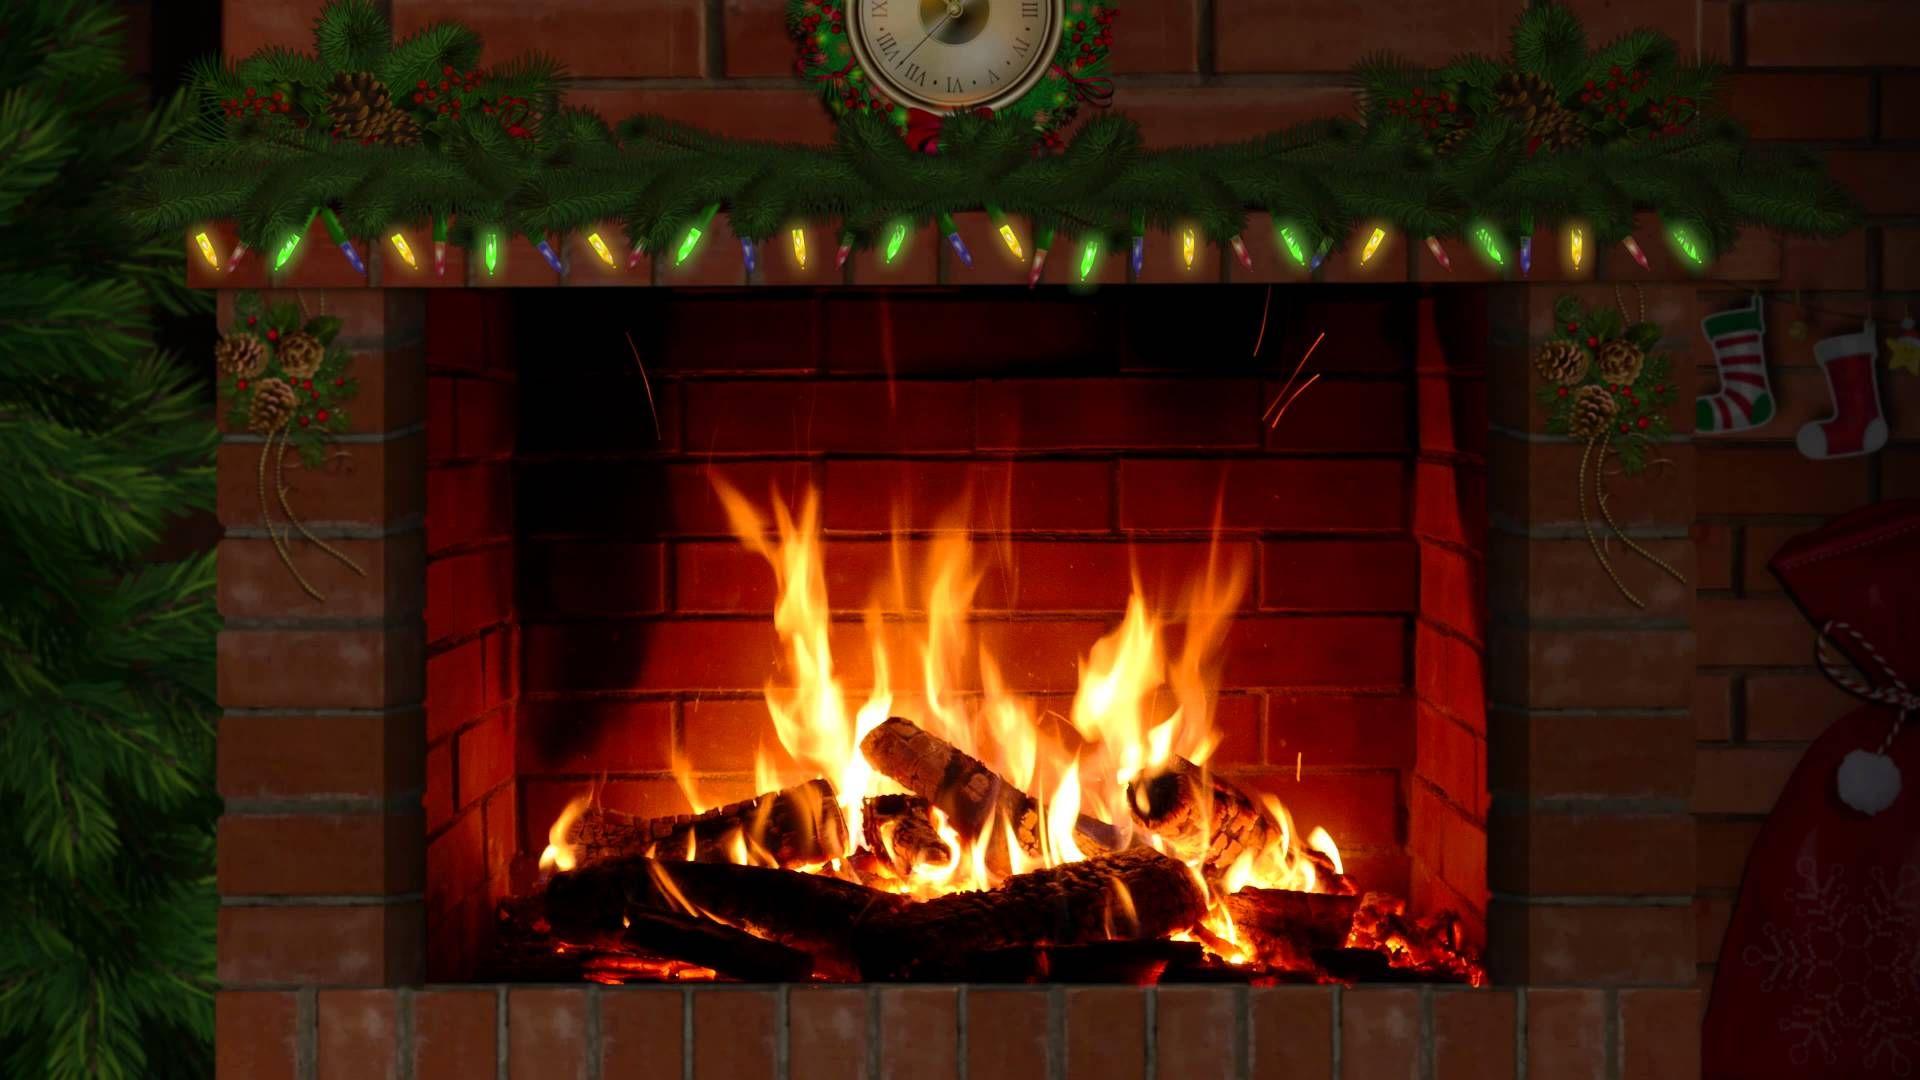 Fireplace with Christmas music 3 hours Enjoy Christmas ...